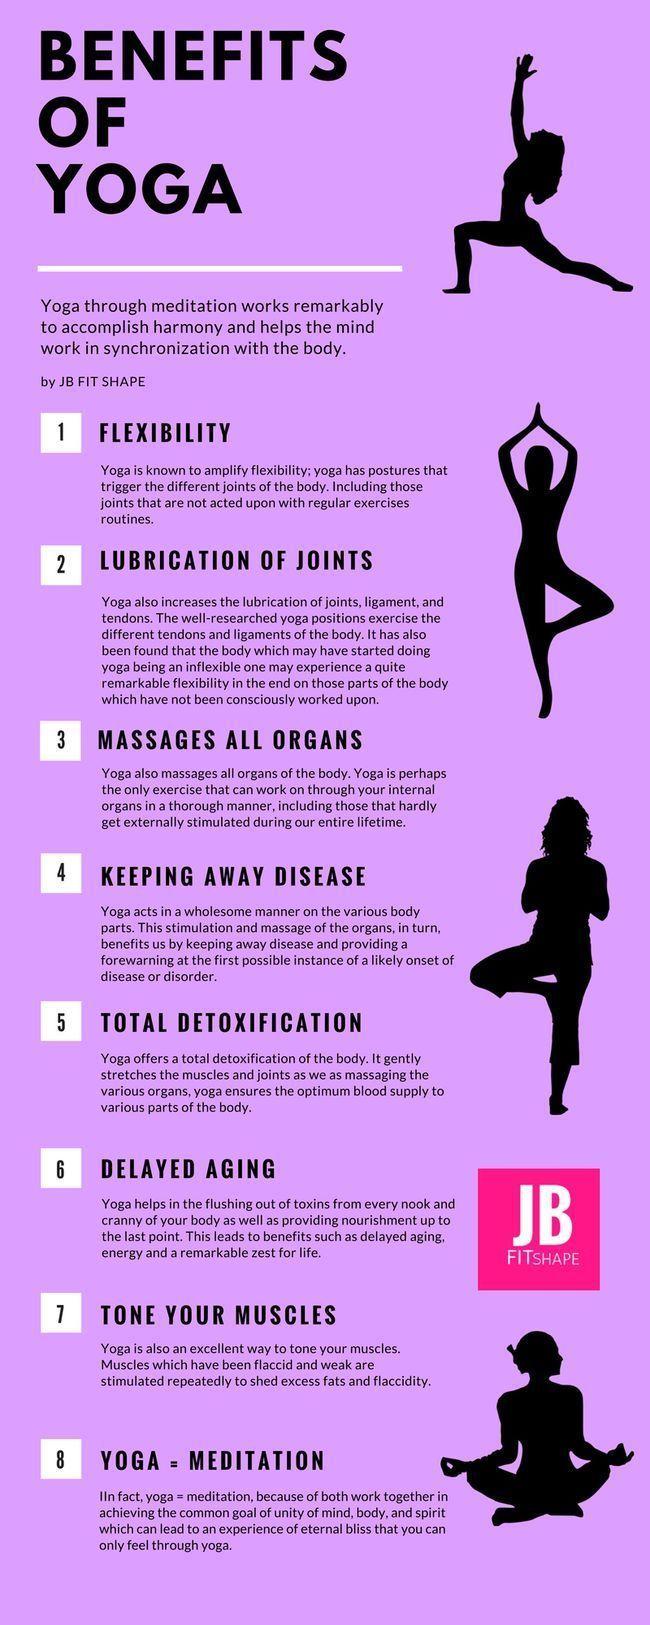 Yoga Poses Workout Benefits Of Yoga Yoga How To Do Yoga Yoga Benefits Yoga For Beginners